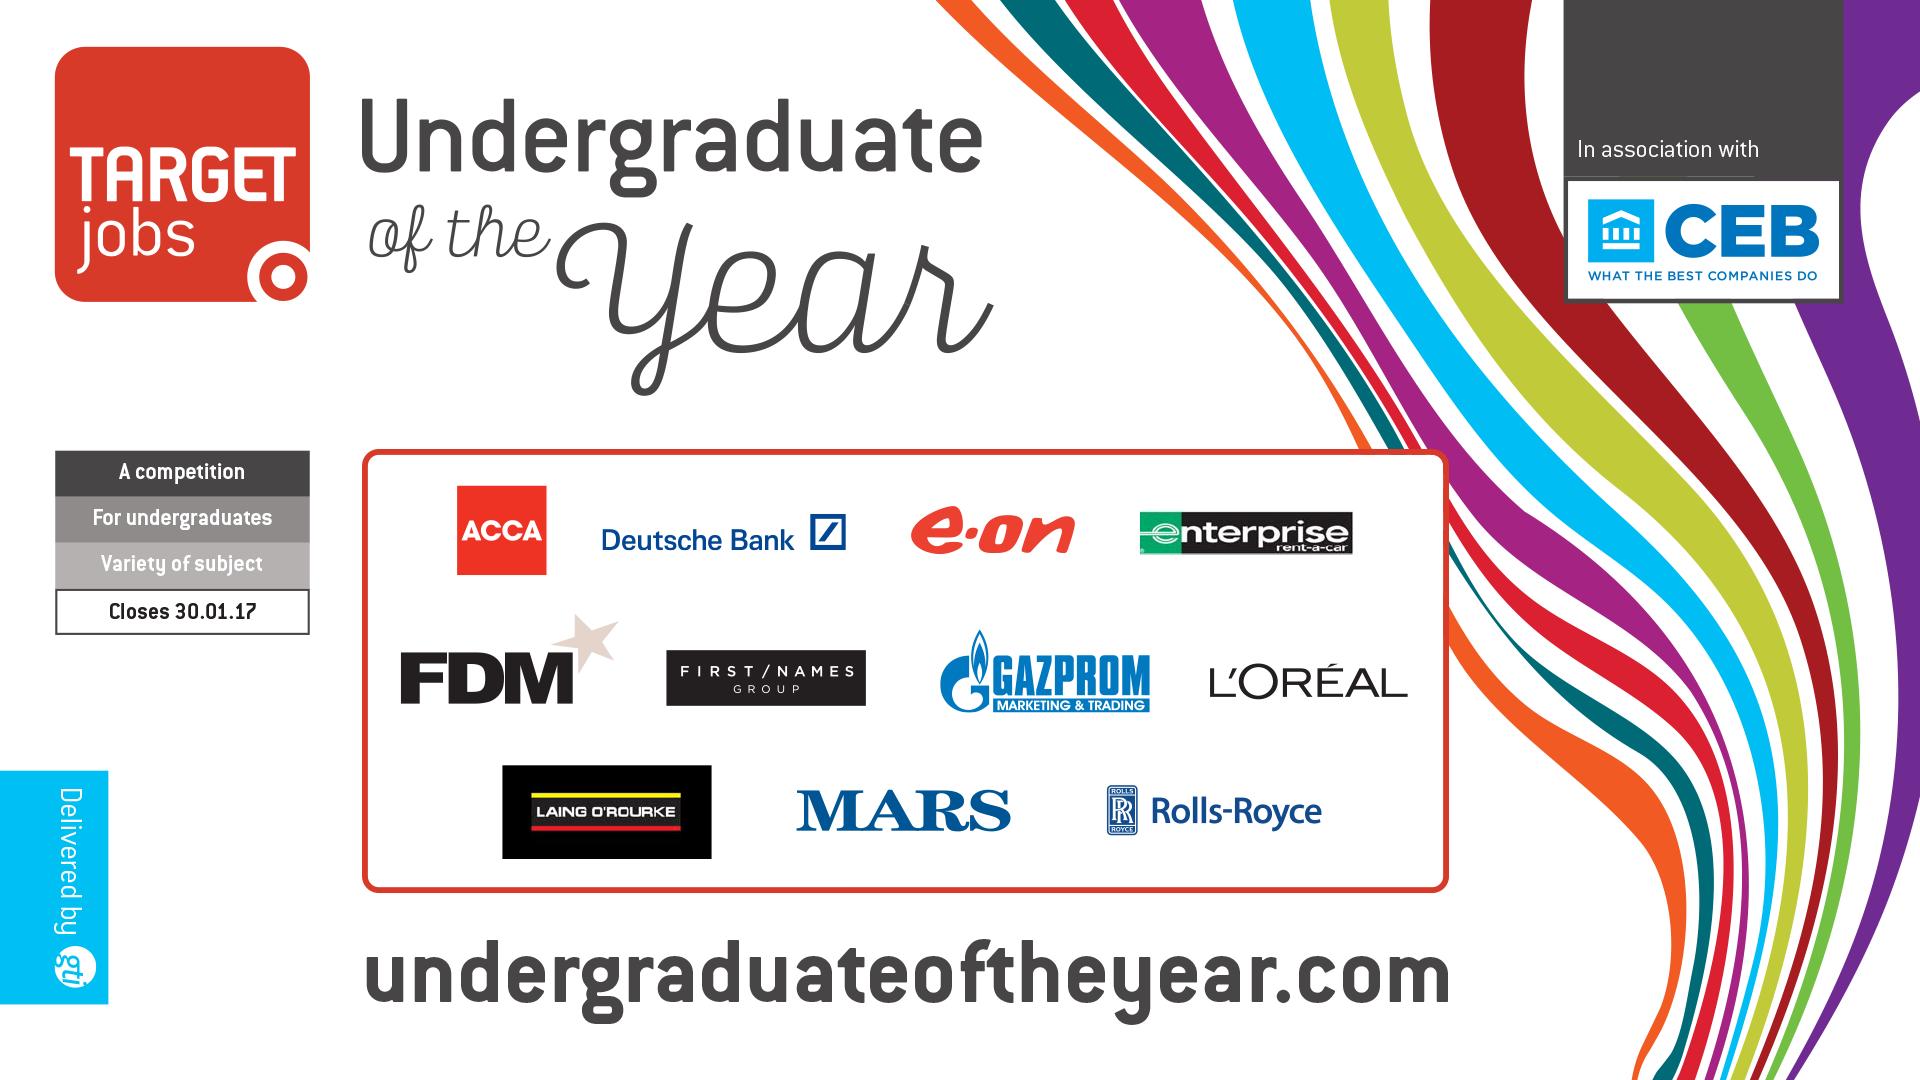 TARGETjobs Undergraduate of the Year